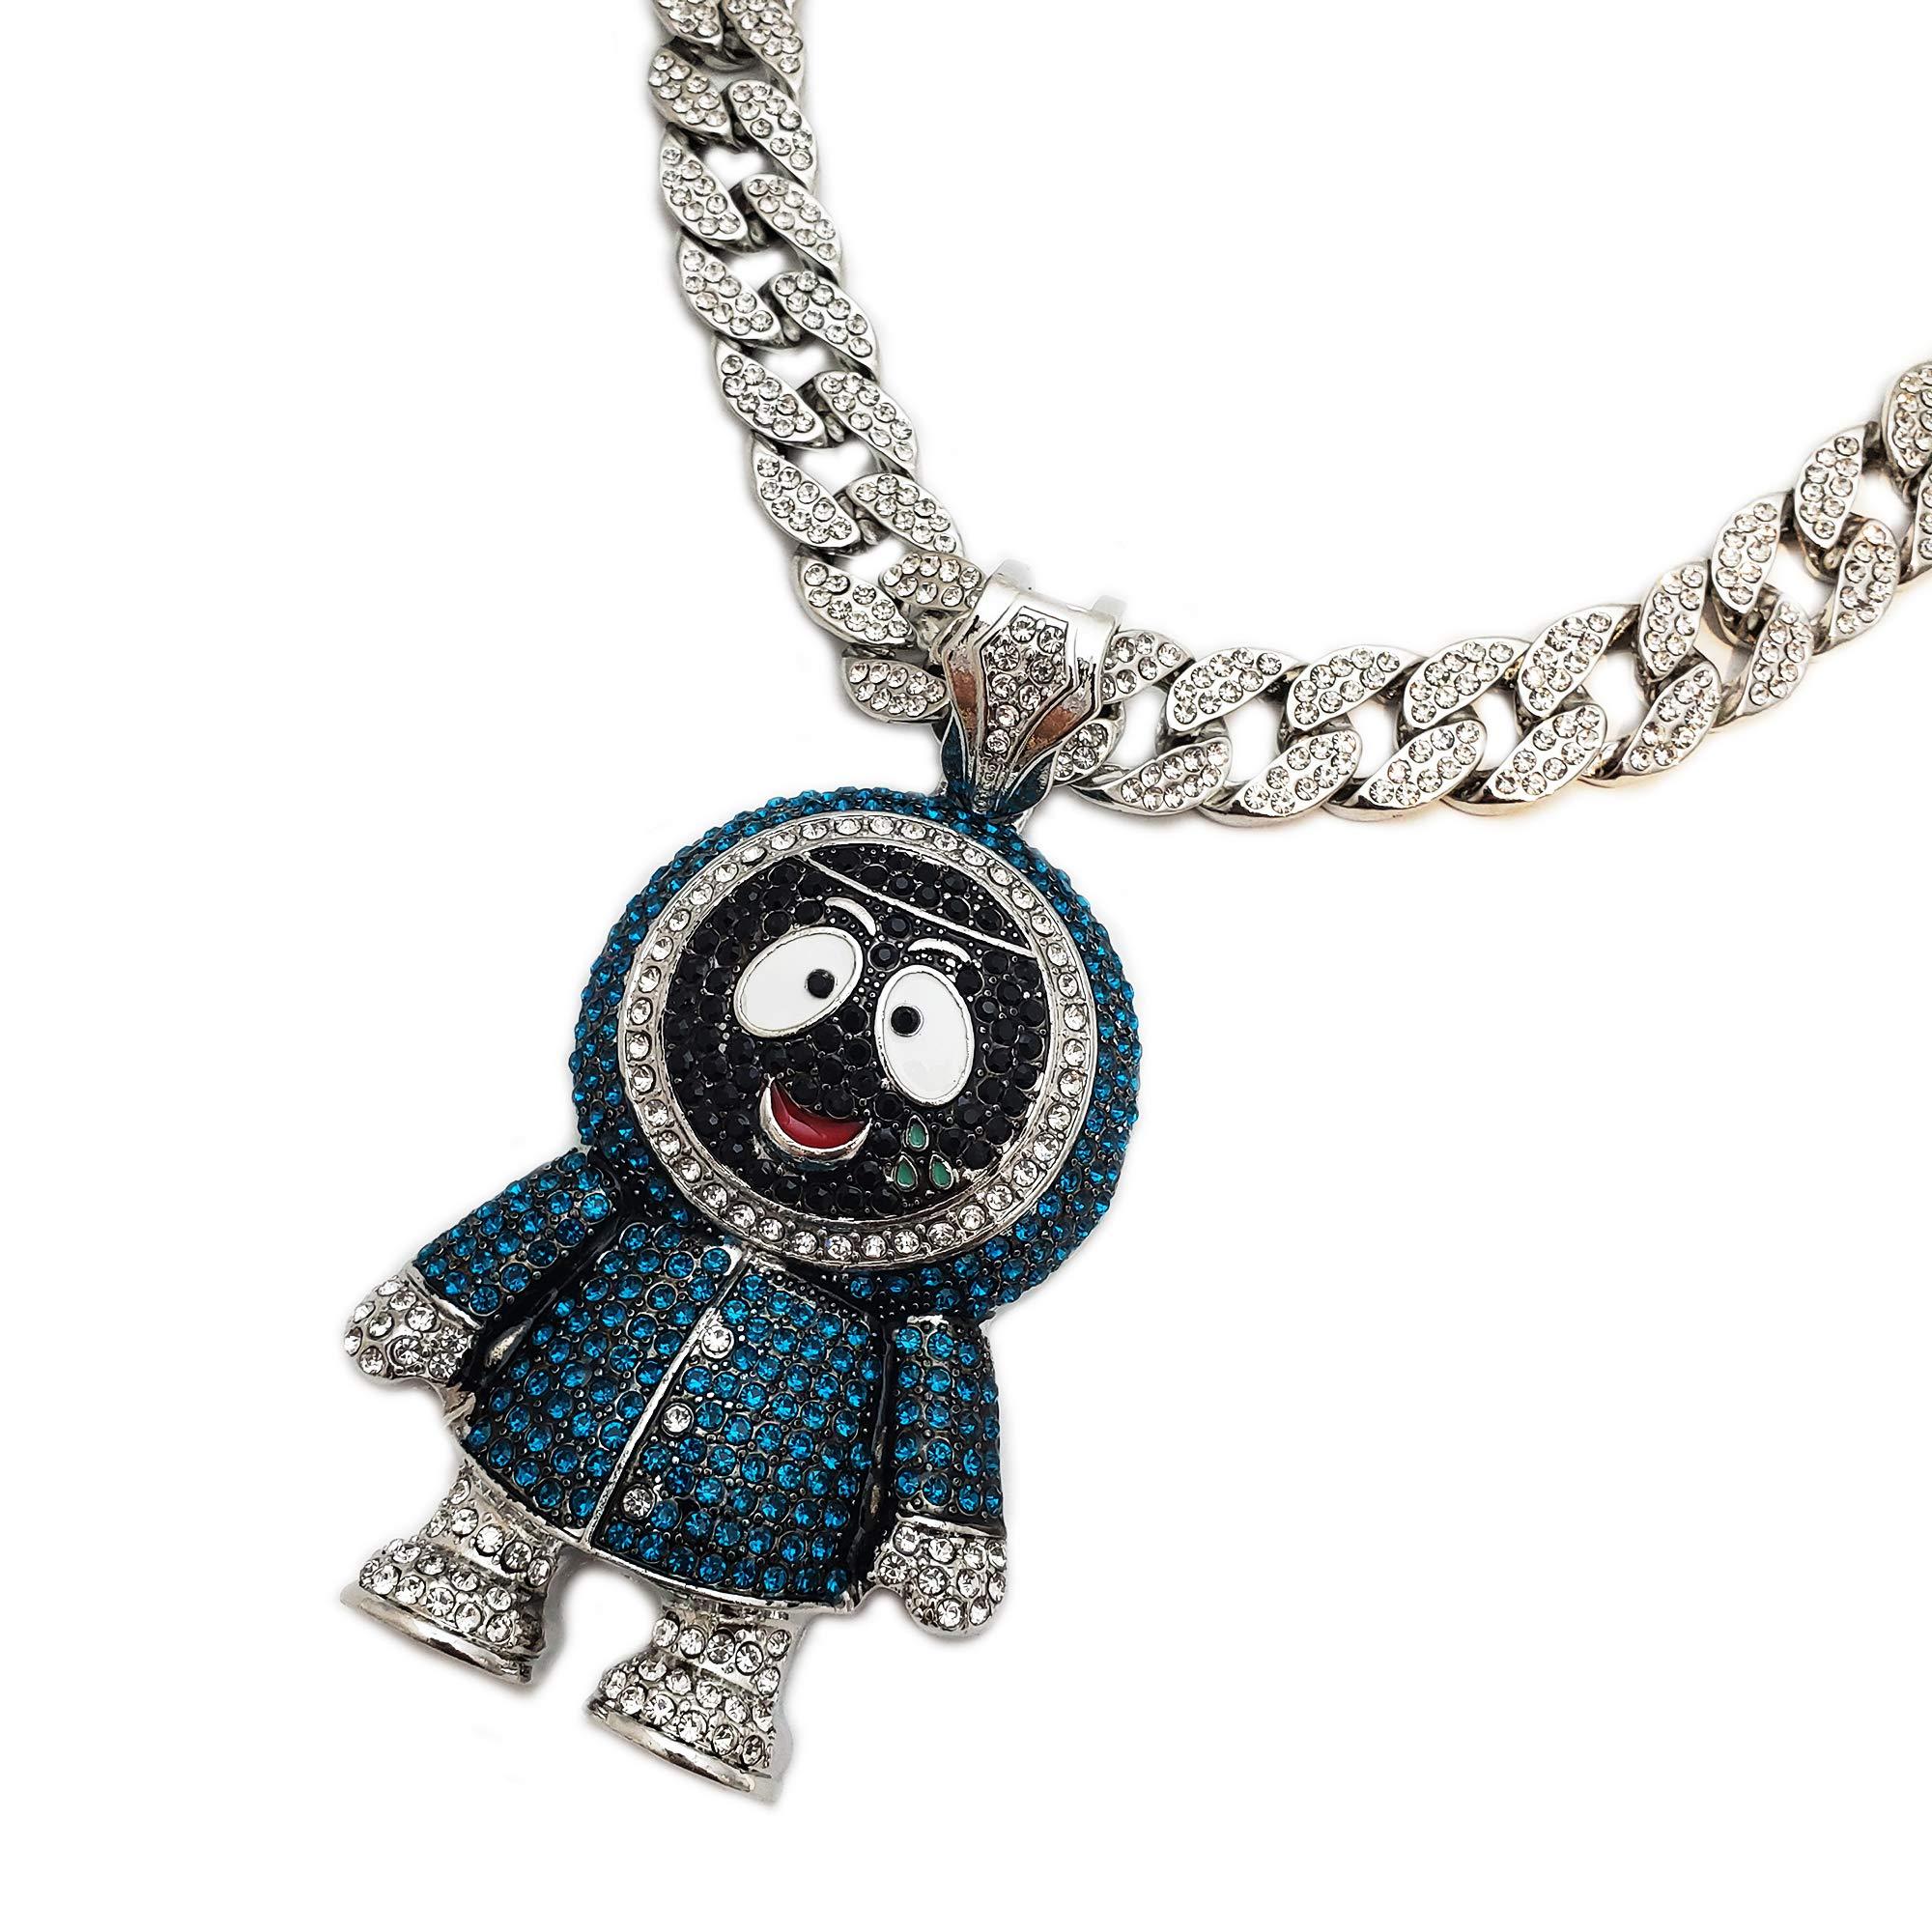 BLINGFACTORY Hip Hop Iced Out Large Brick Squad Eskimo Pendant & 18'' 1 Row Tennis Choker Chain Necklace